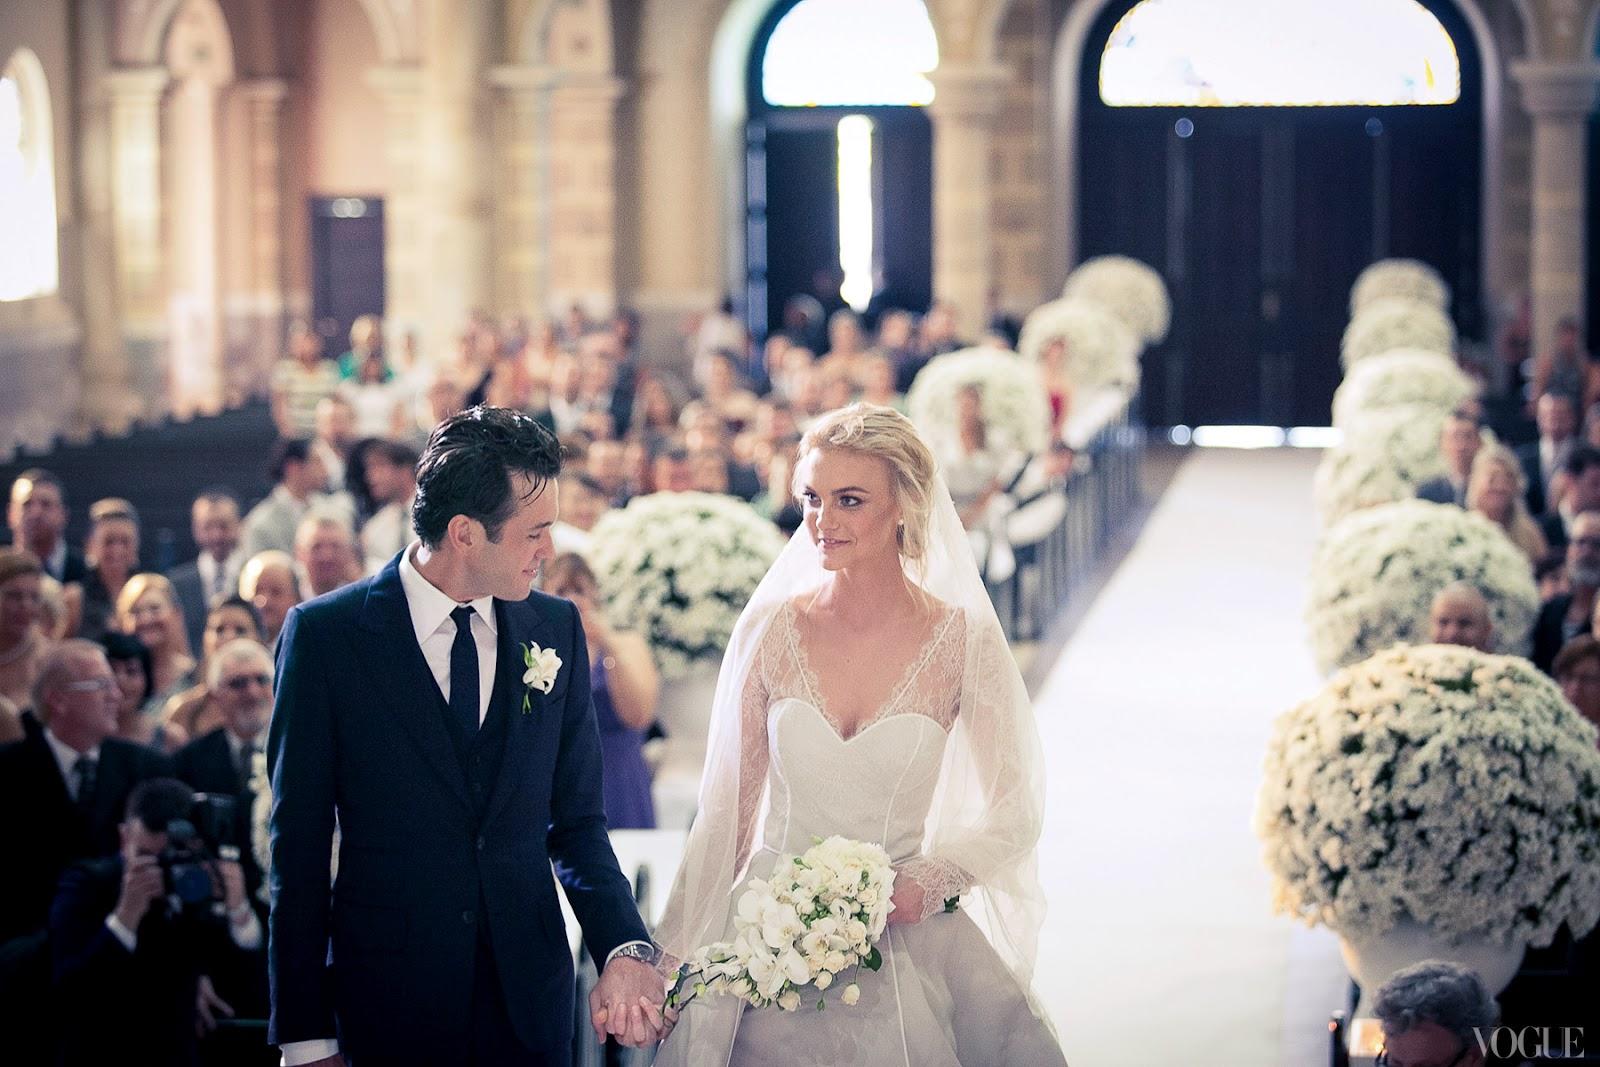 It Girl Caroline Trentinis Wedding Dress Designed By Olivier Theyskens